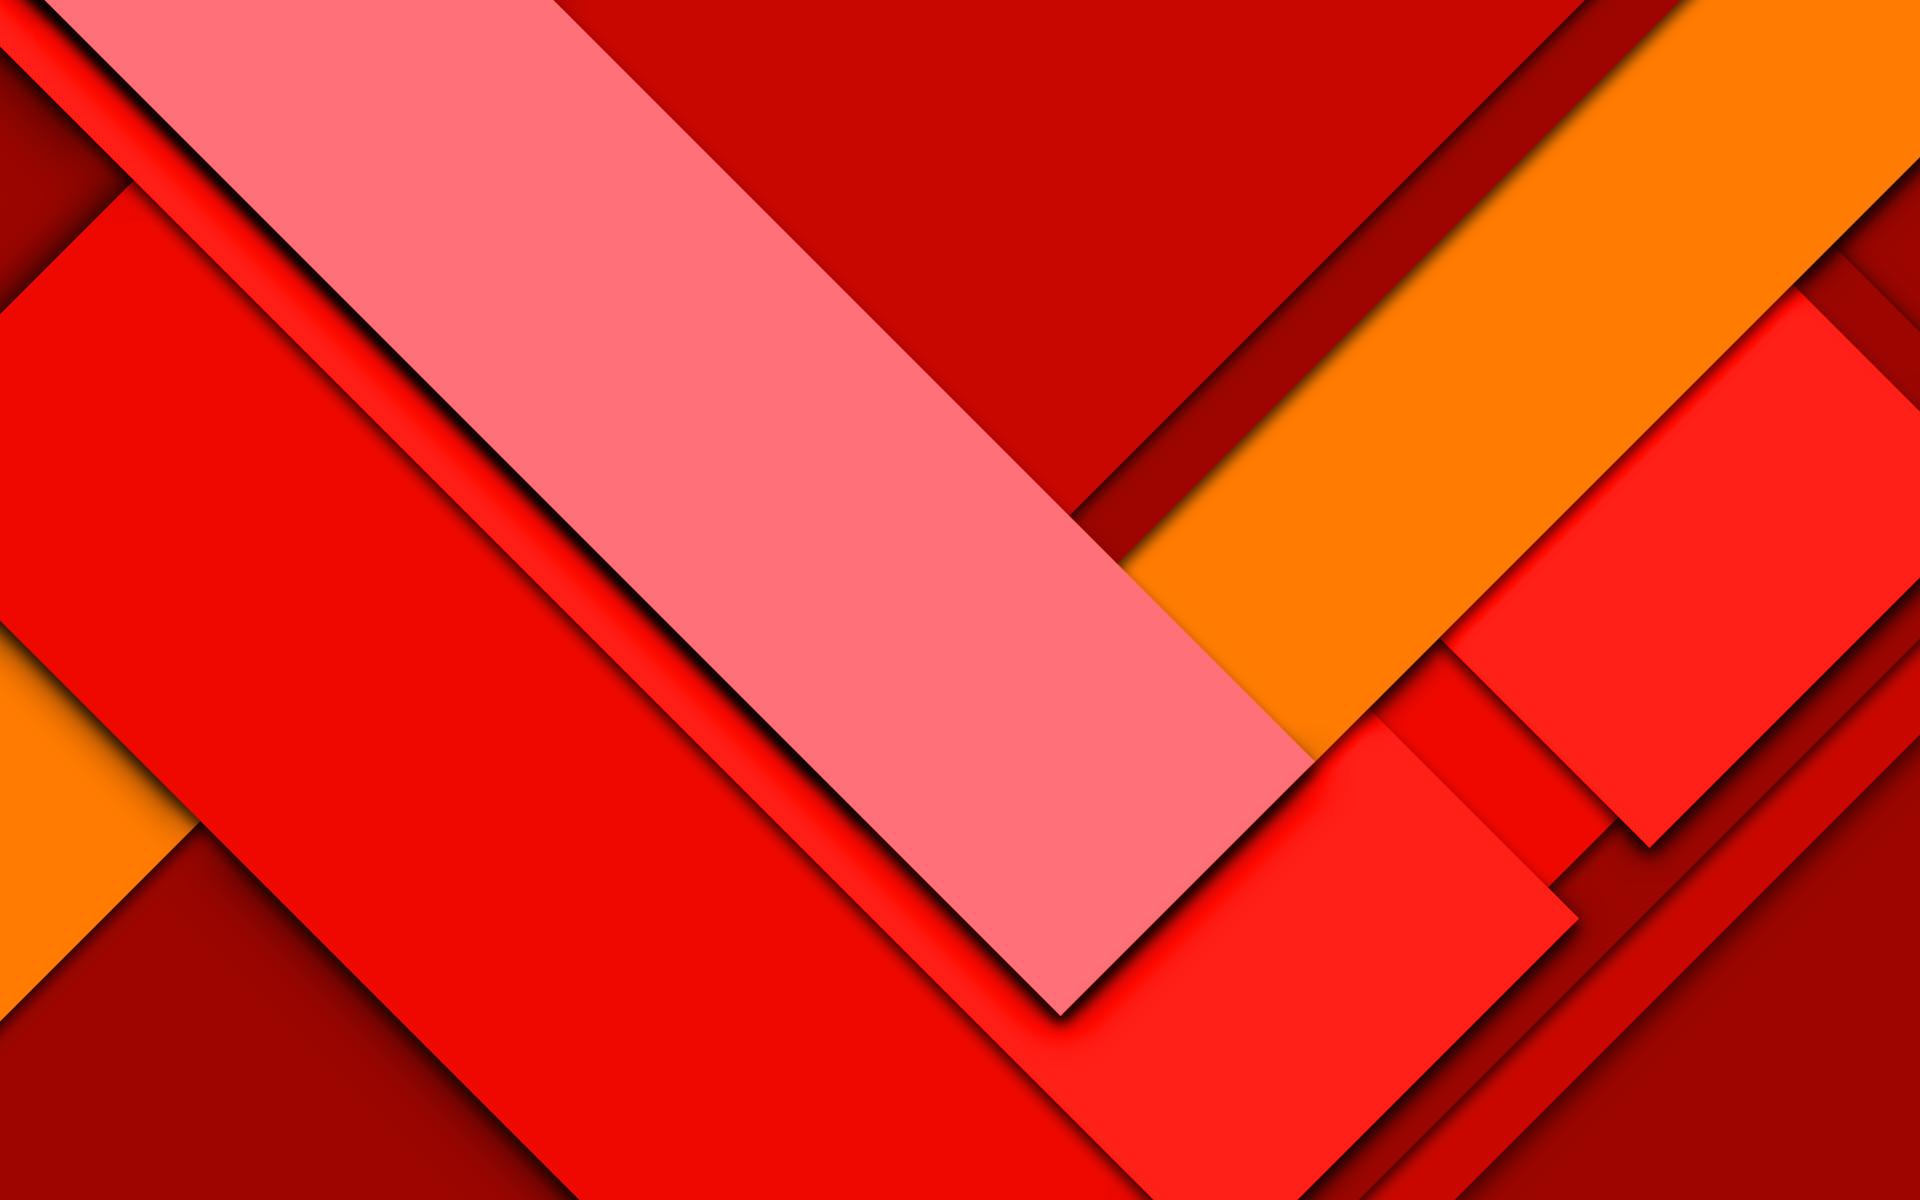 Material Design Wallpaper Red Mix